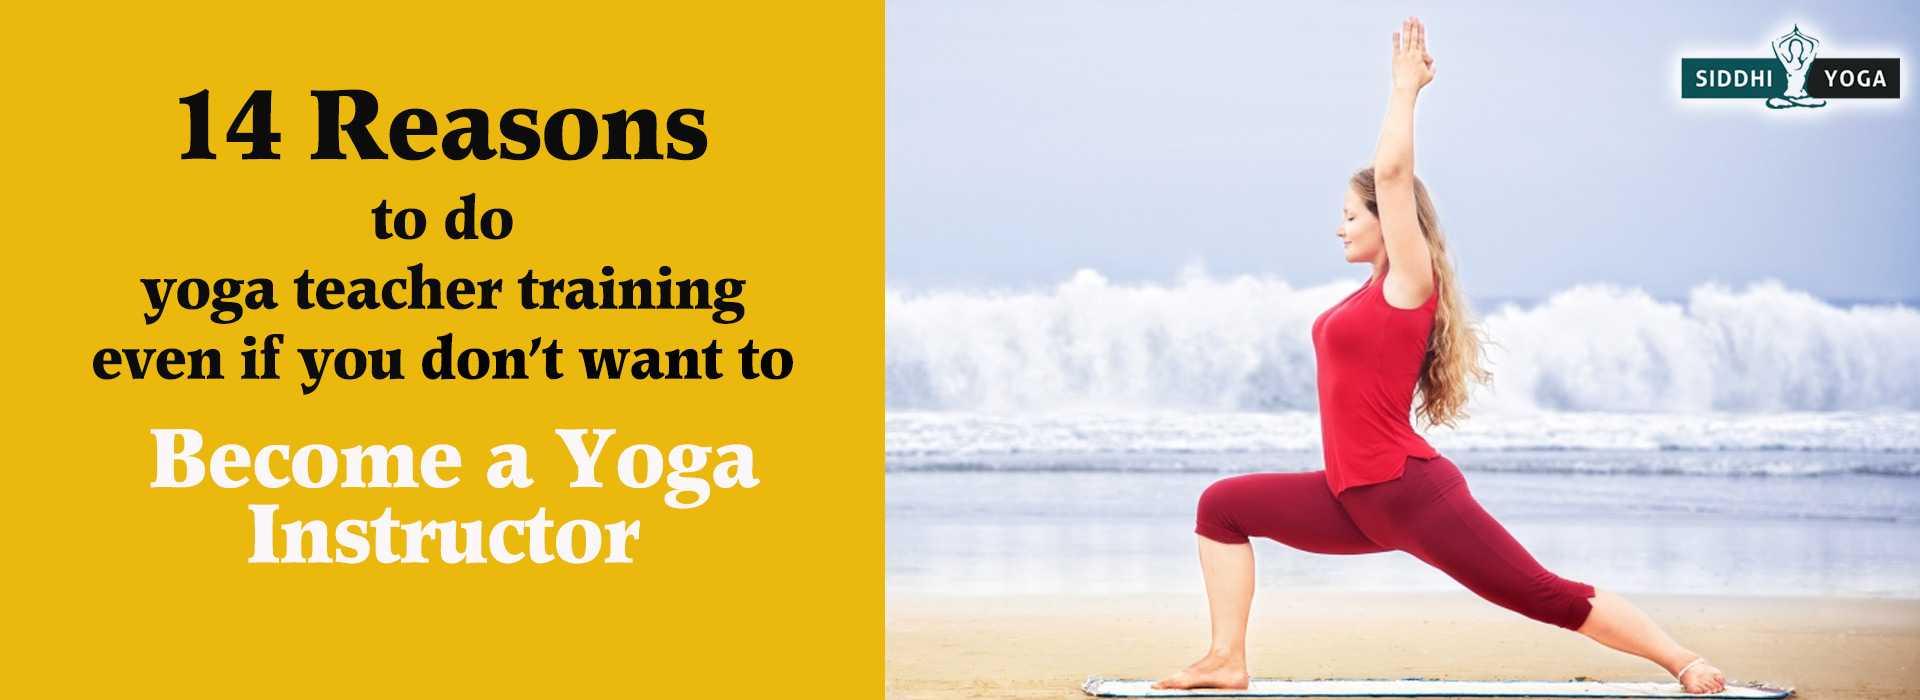 Why Should I Do Yoga Teacher Training